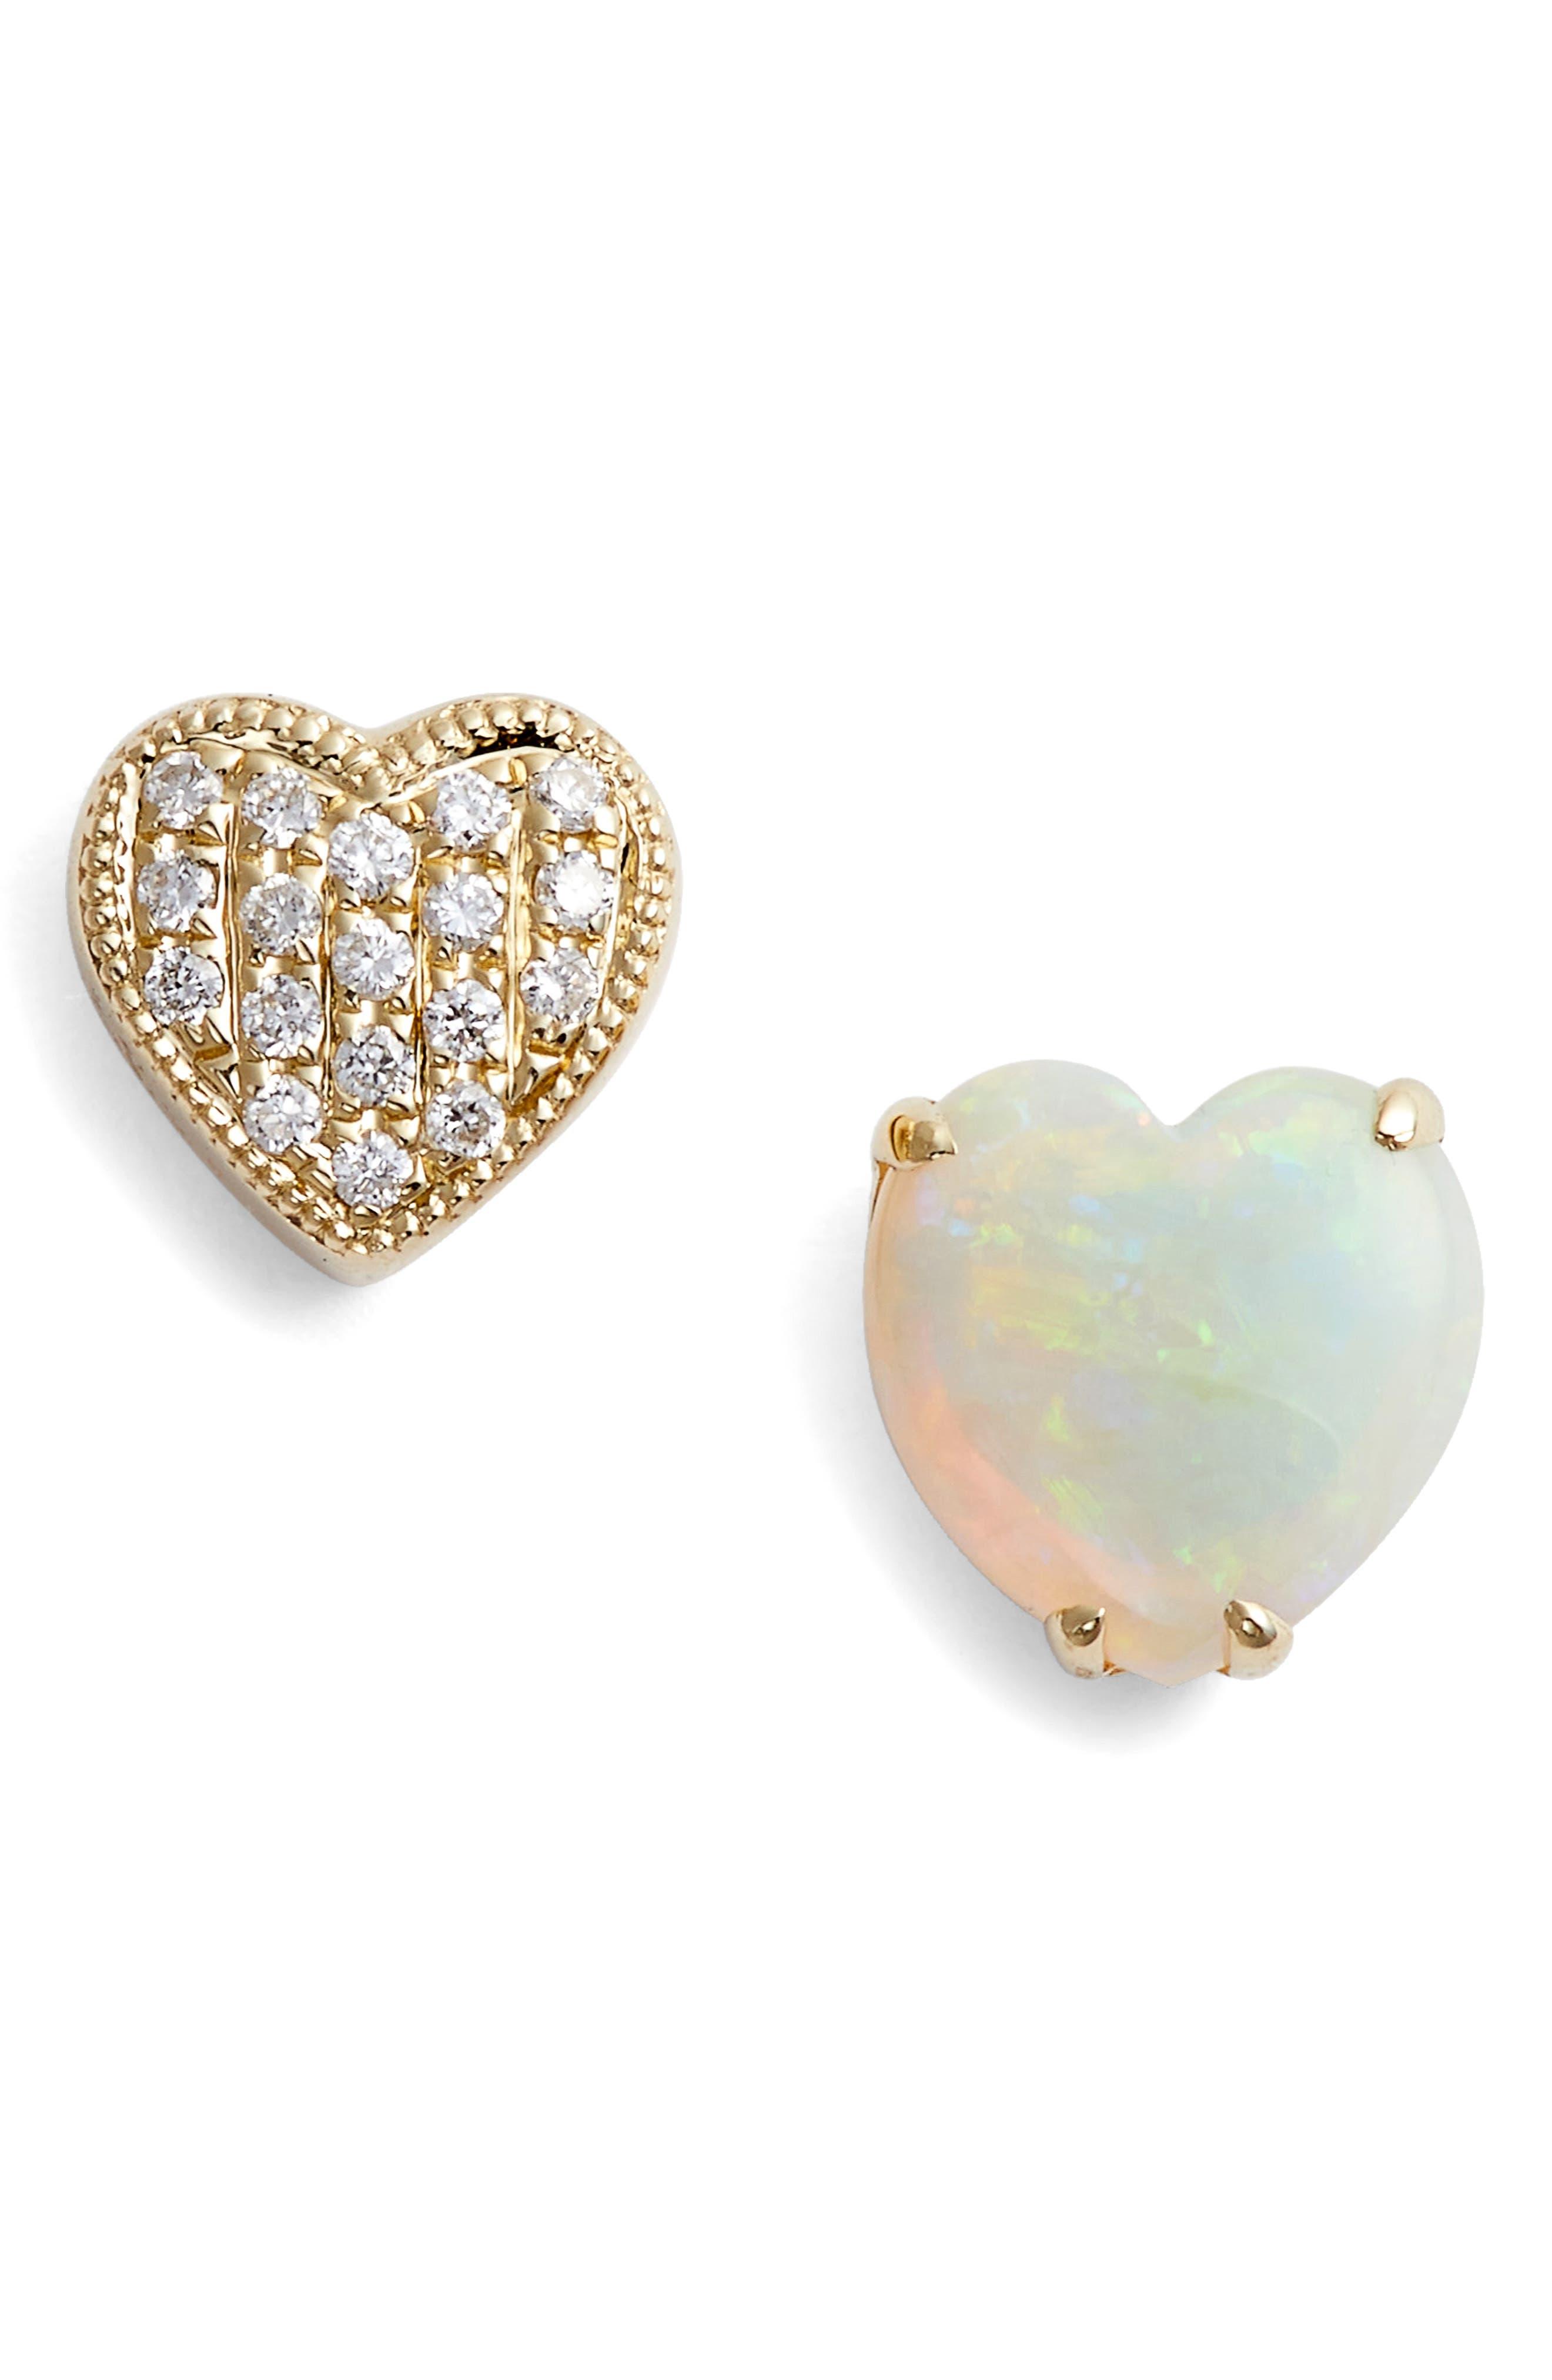 Diamond & Semiprecious Stone Stud Earrings,                             Main thumbnail 1, color,                             YELLOW GOLD